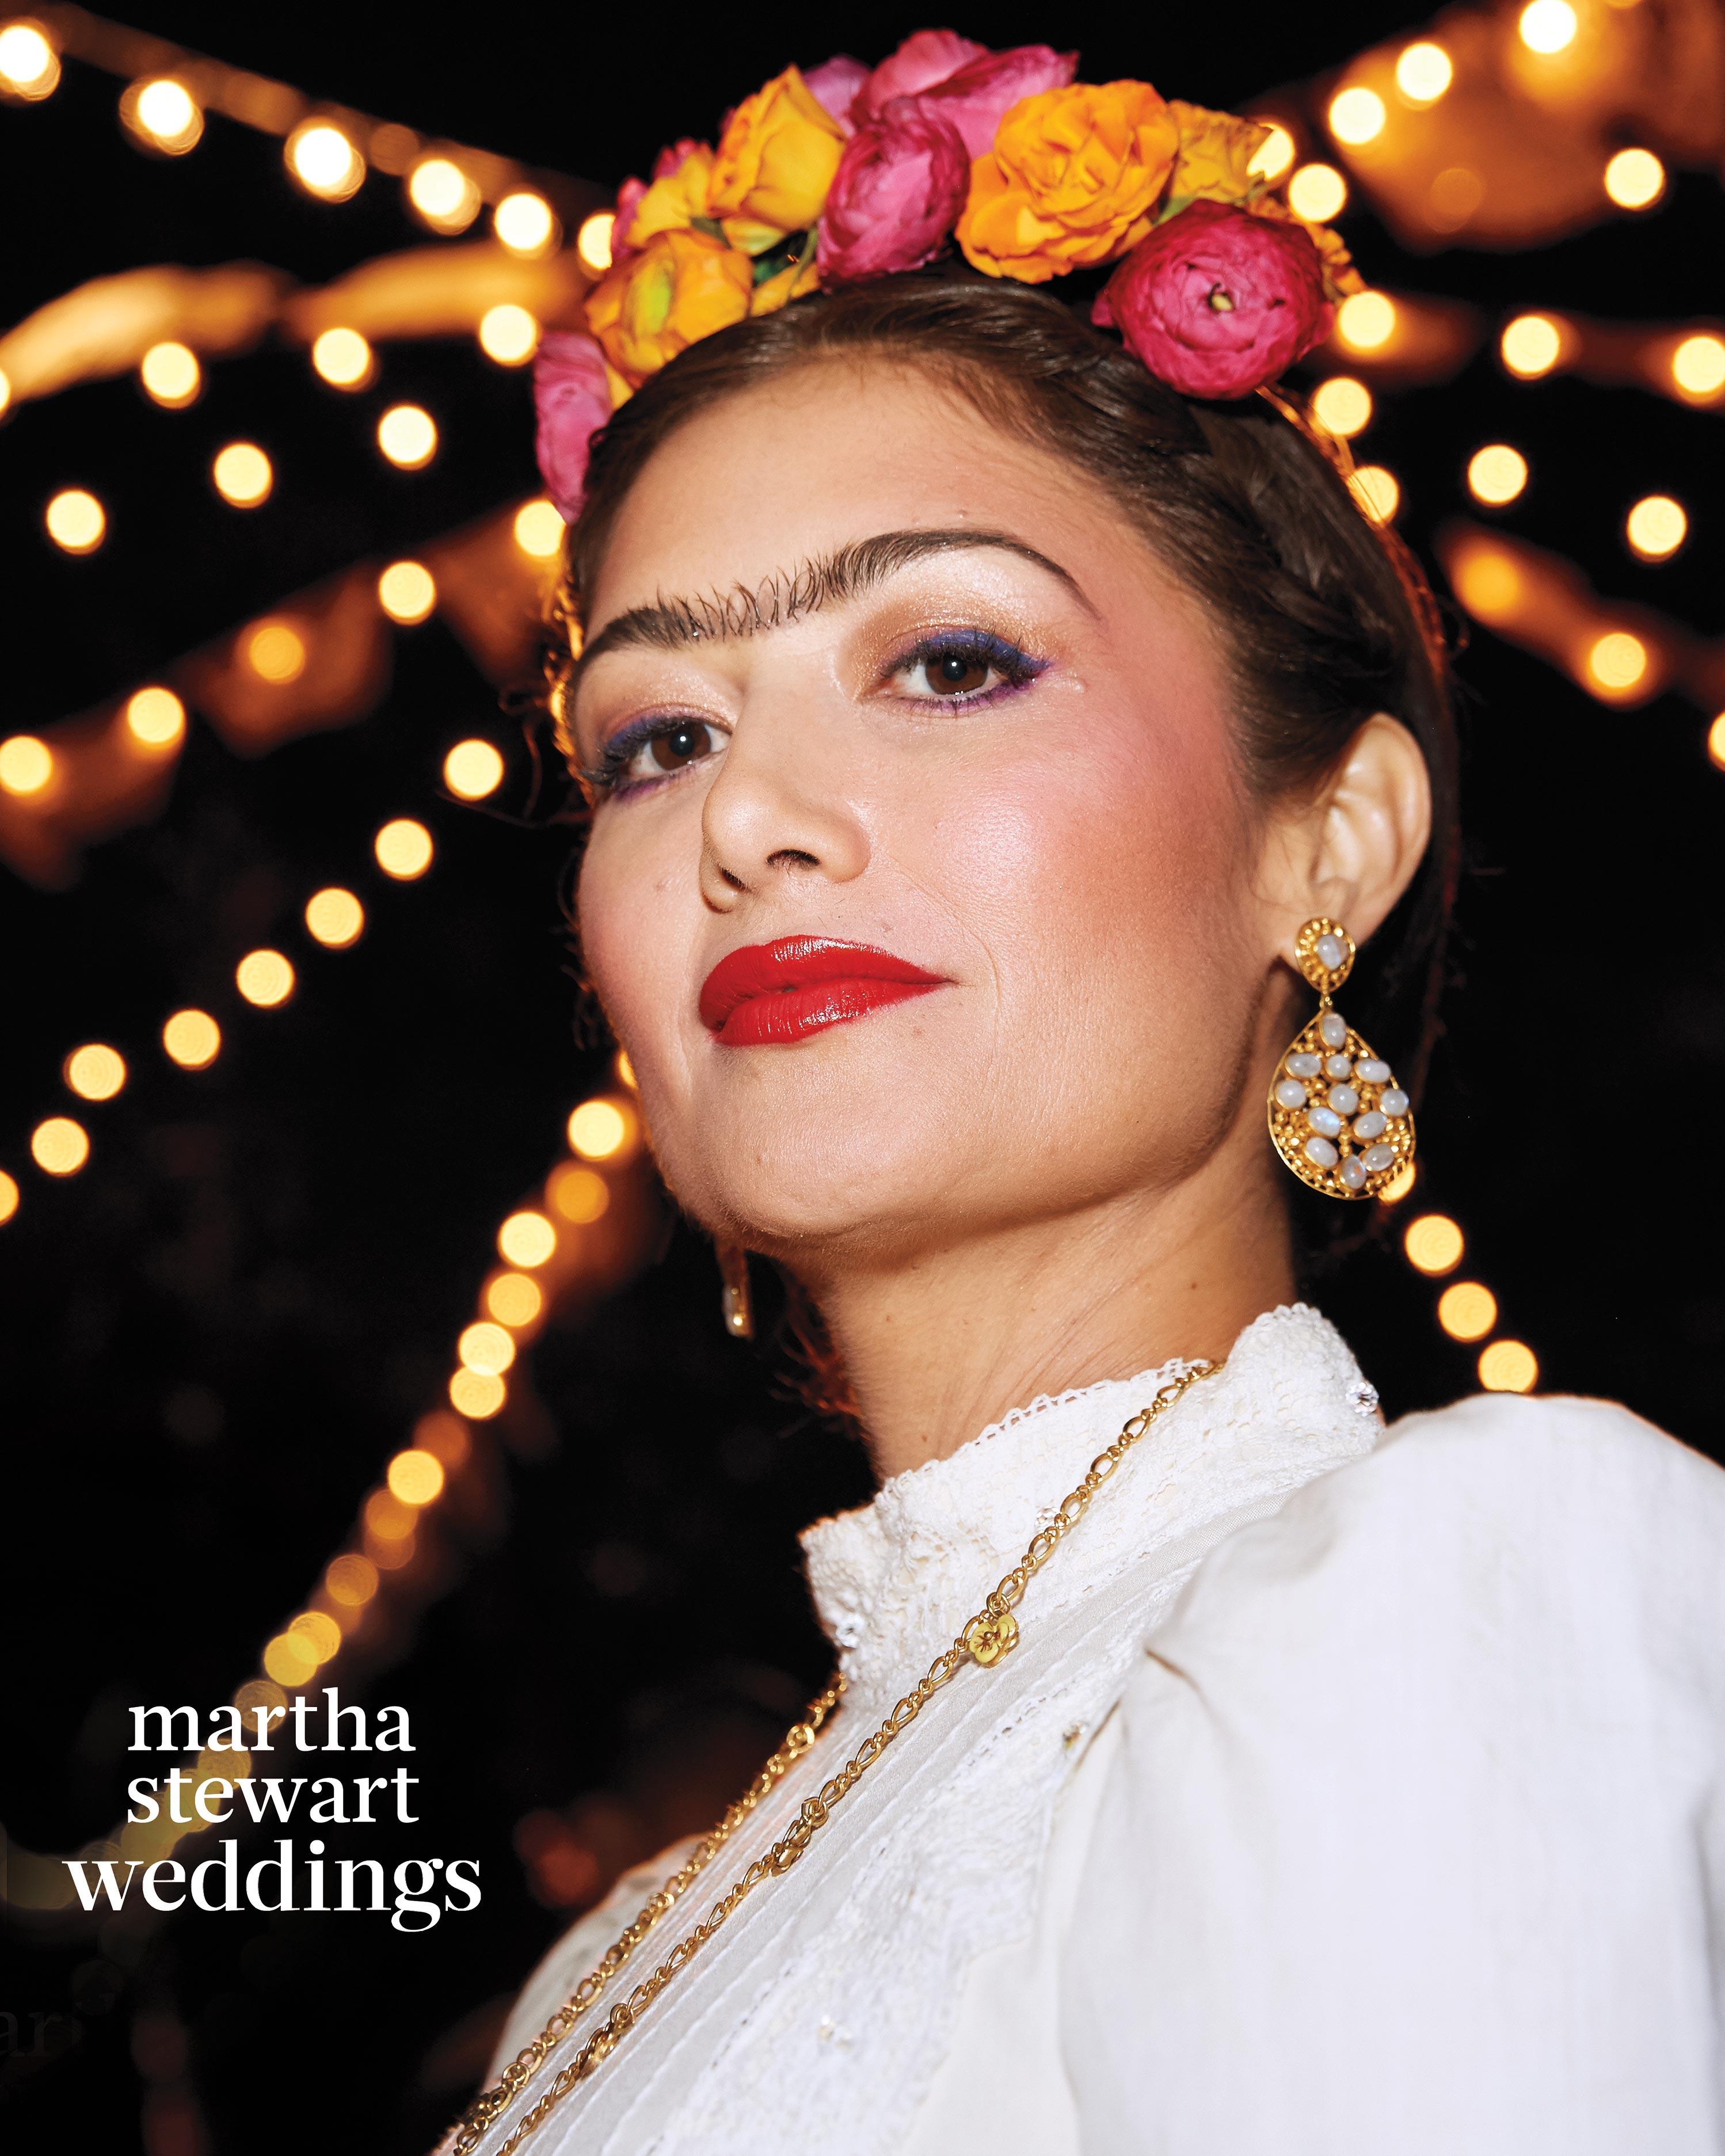 jamie-bryan-wedding-11-costume-party-frida-0688-d112664.jpg